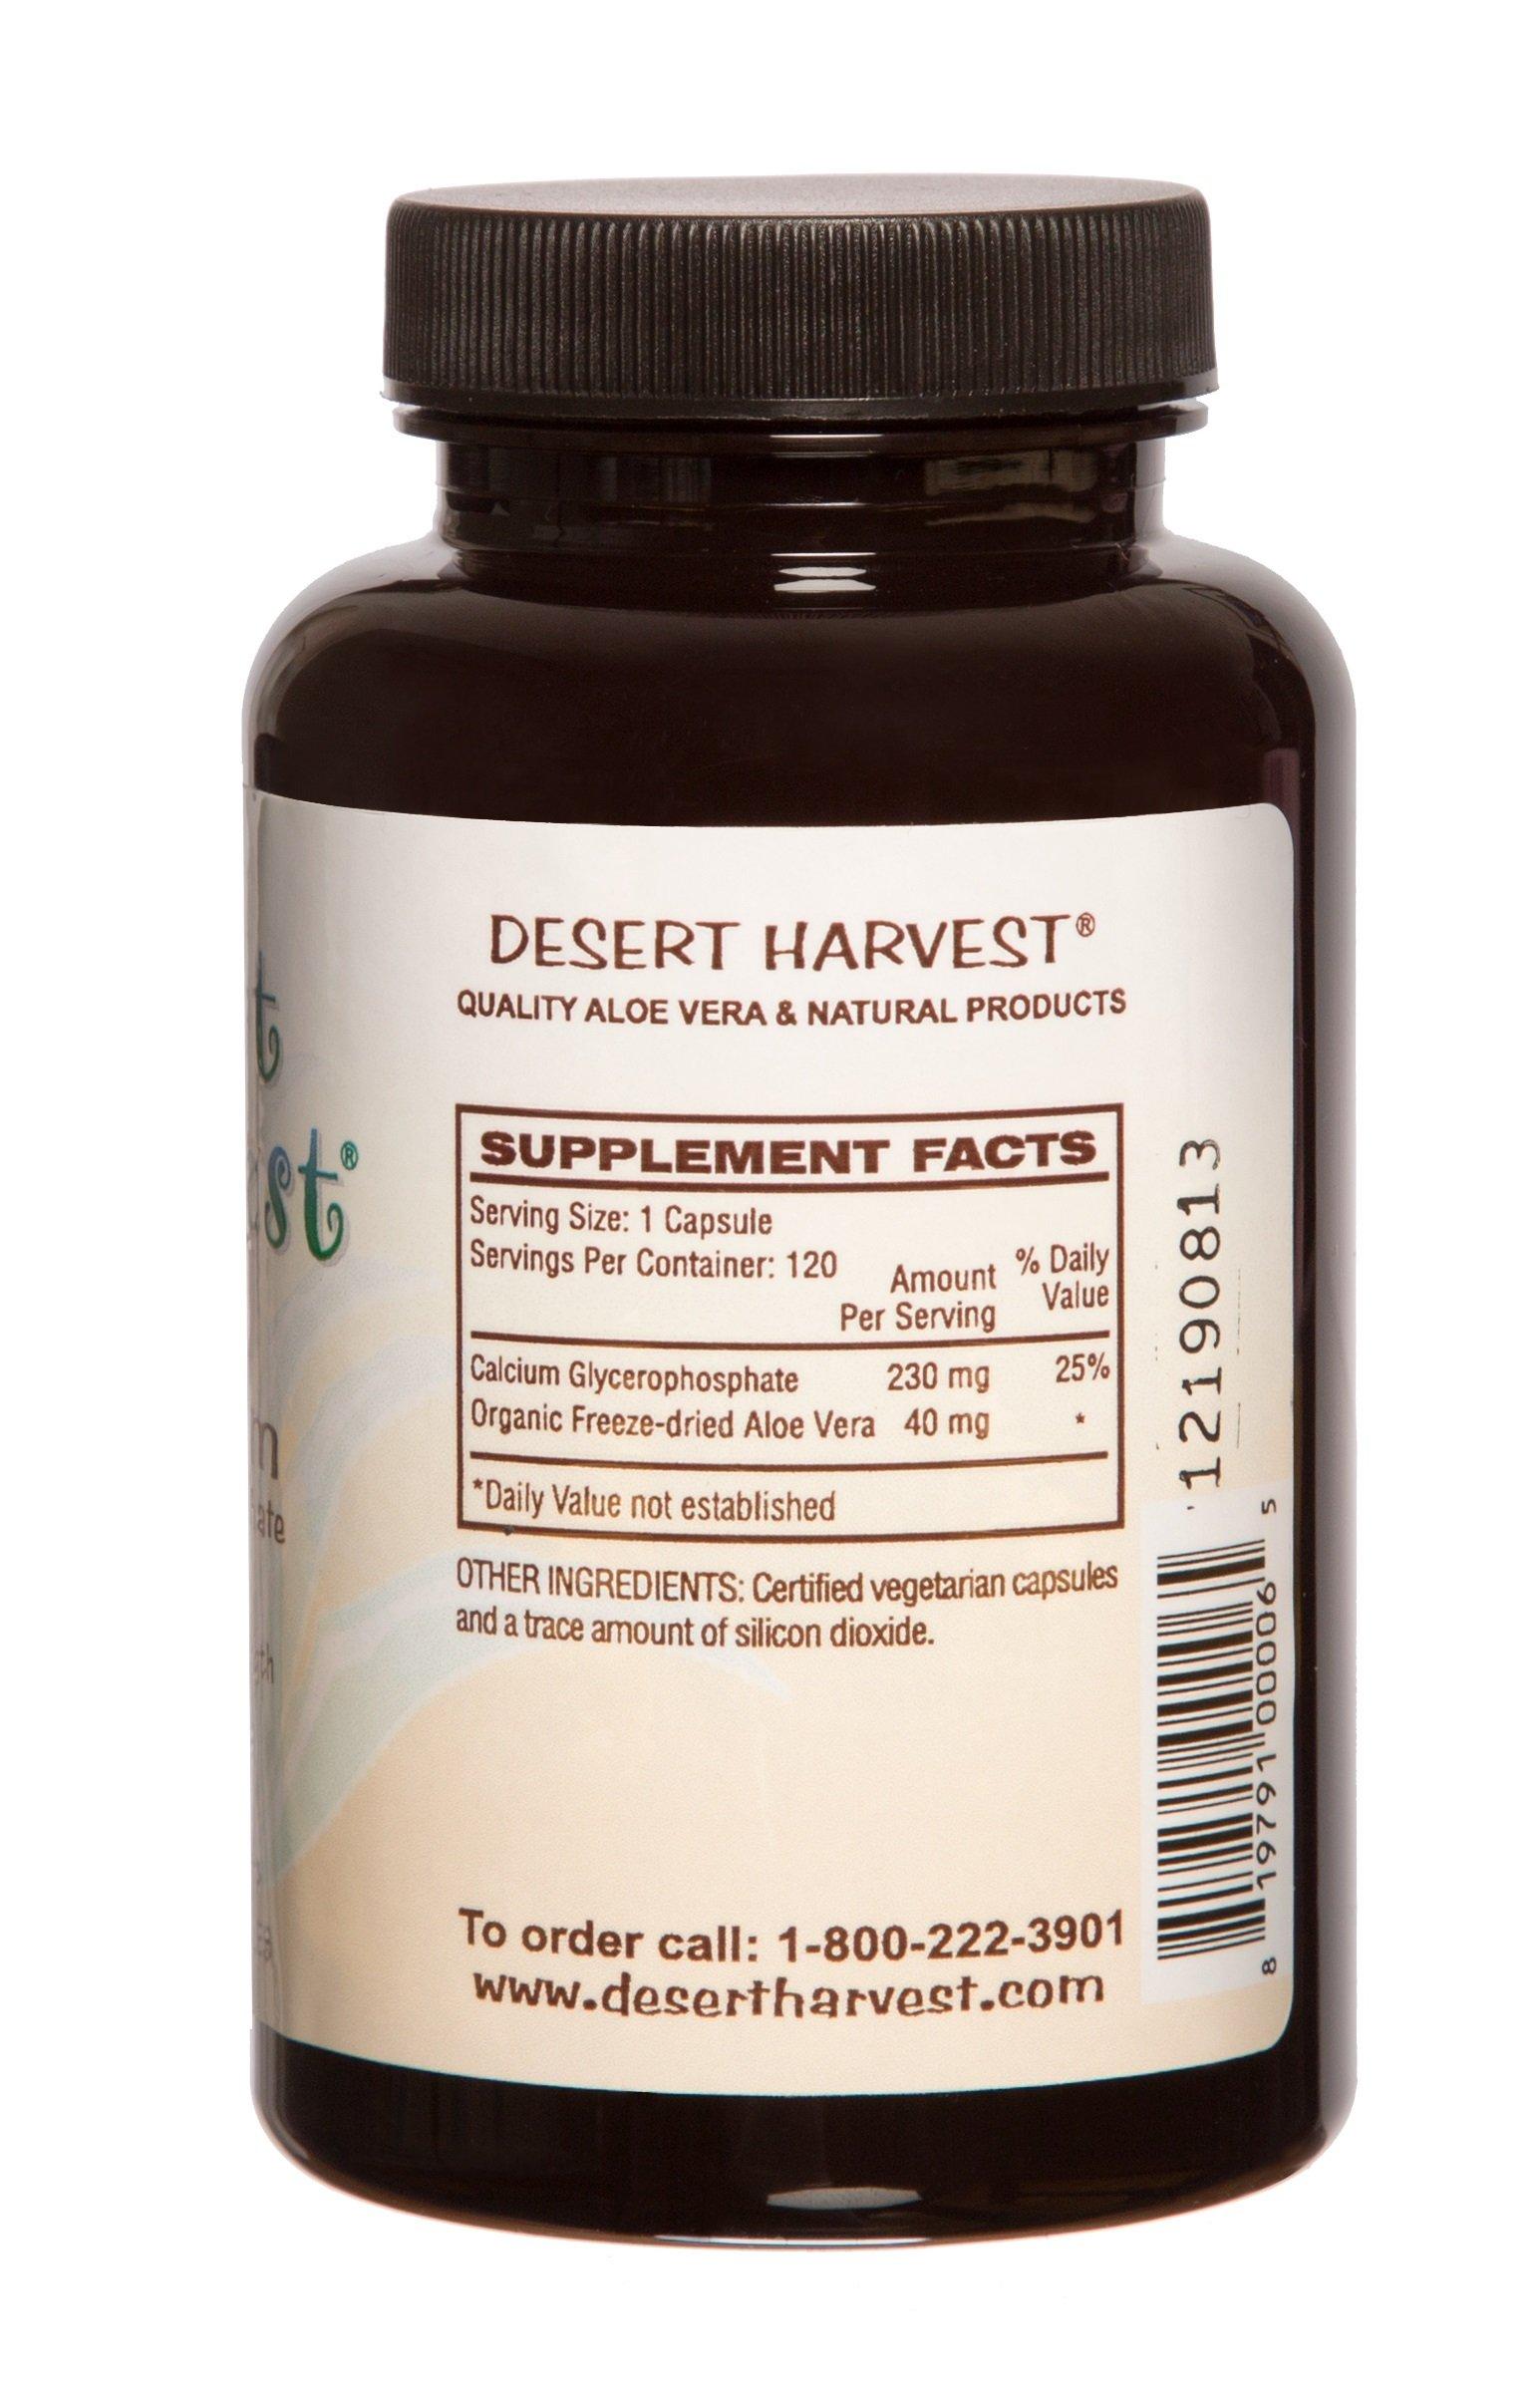 Interstitial Cystitis Starter Kit – Ideal Starter Supplements for IC/BPS. Super-Strength Aloe Vera Capsules + Calcium Glycerophosphate + Quercetin. Bladder Pain Relief, antihistamine, Acid Reducer by Desert Harvest (Image #3)